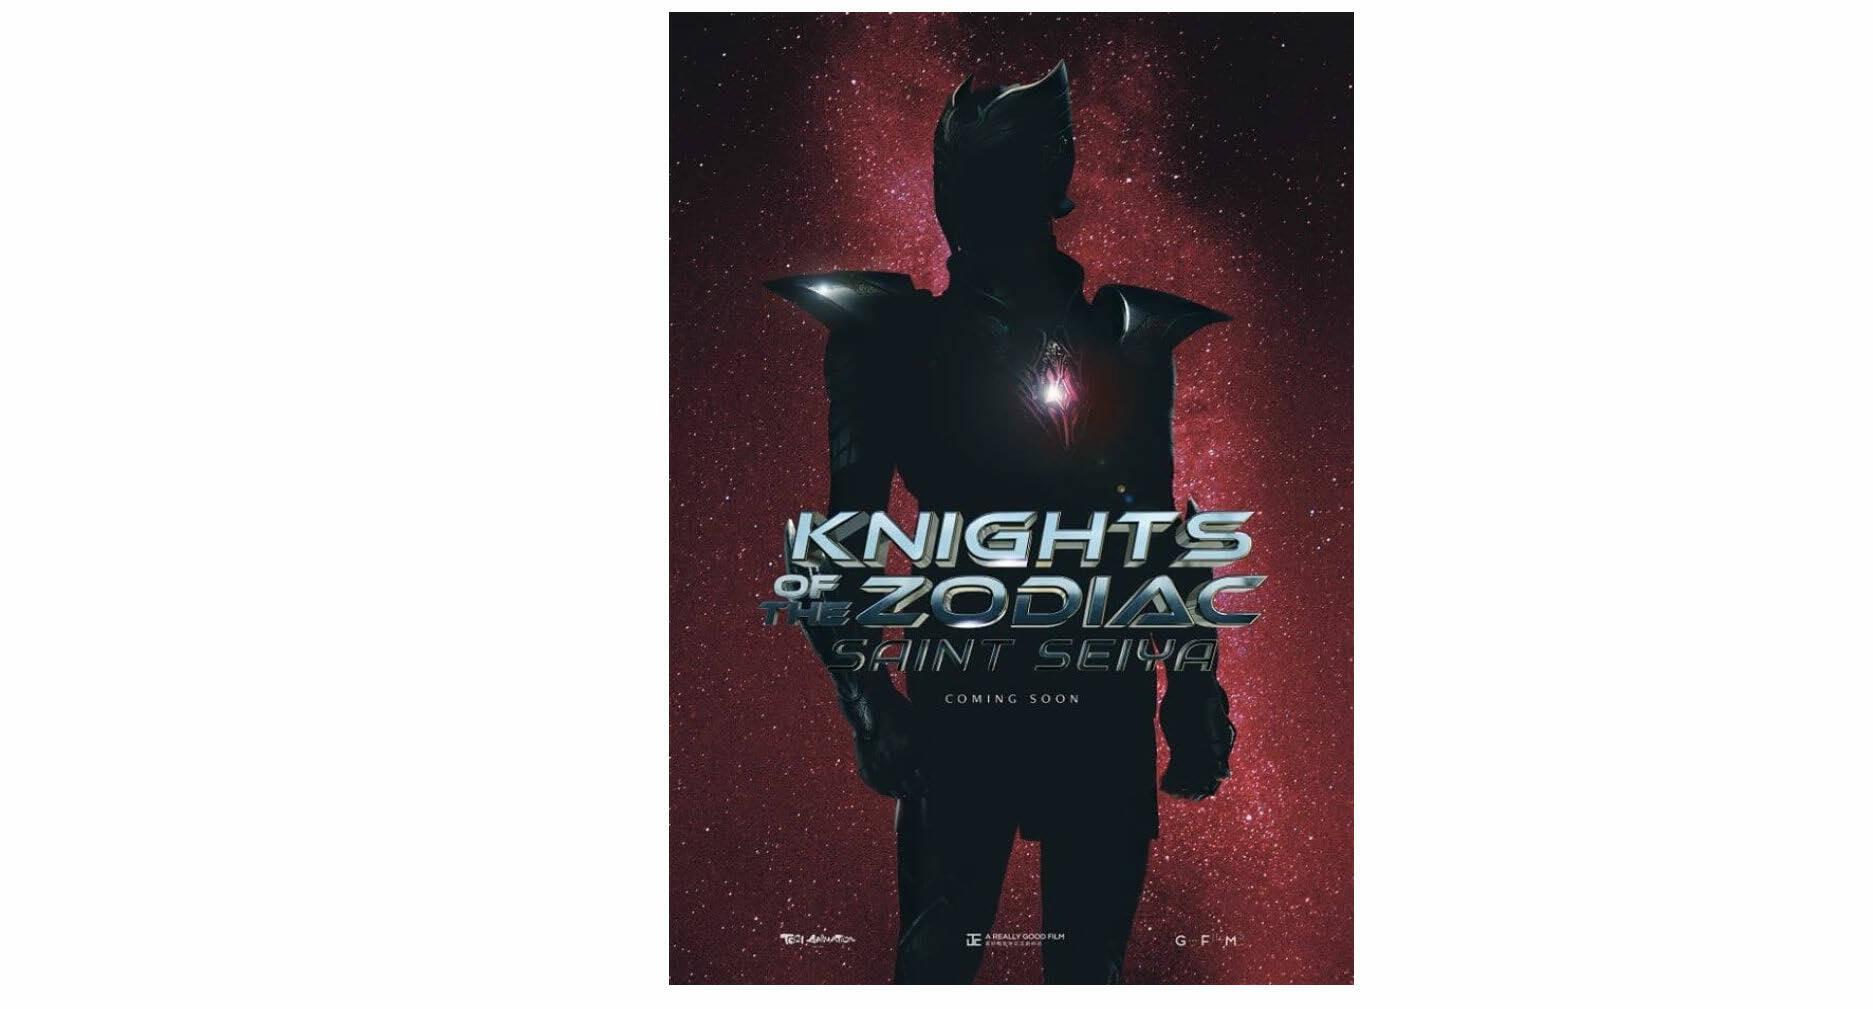 Saint Seiya – Knights of the Zodiac